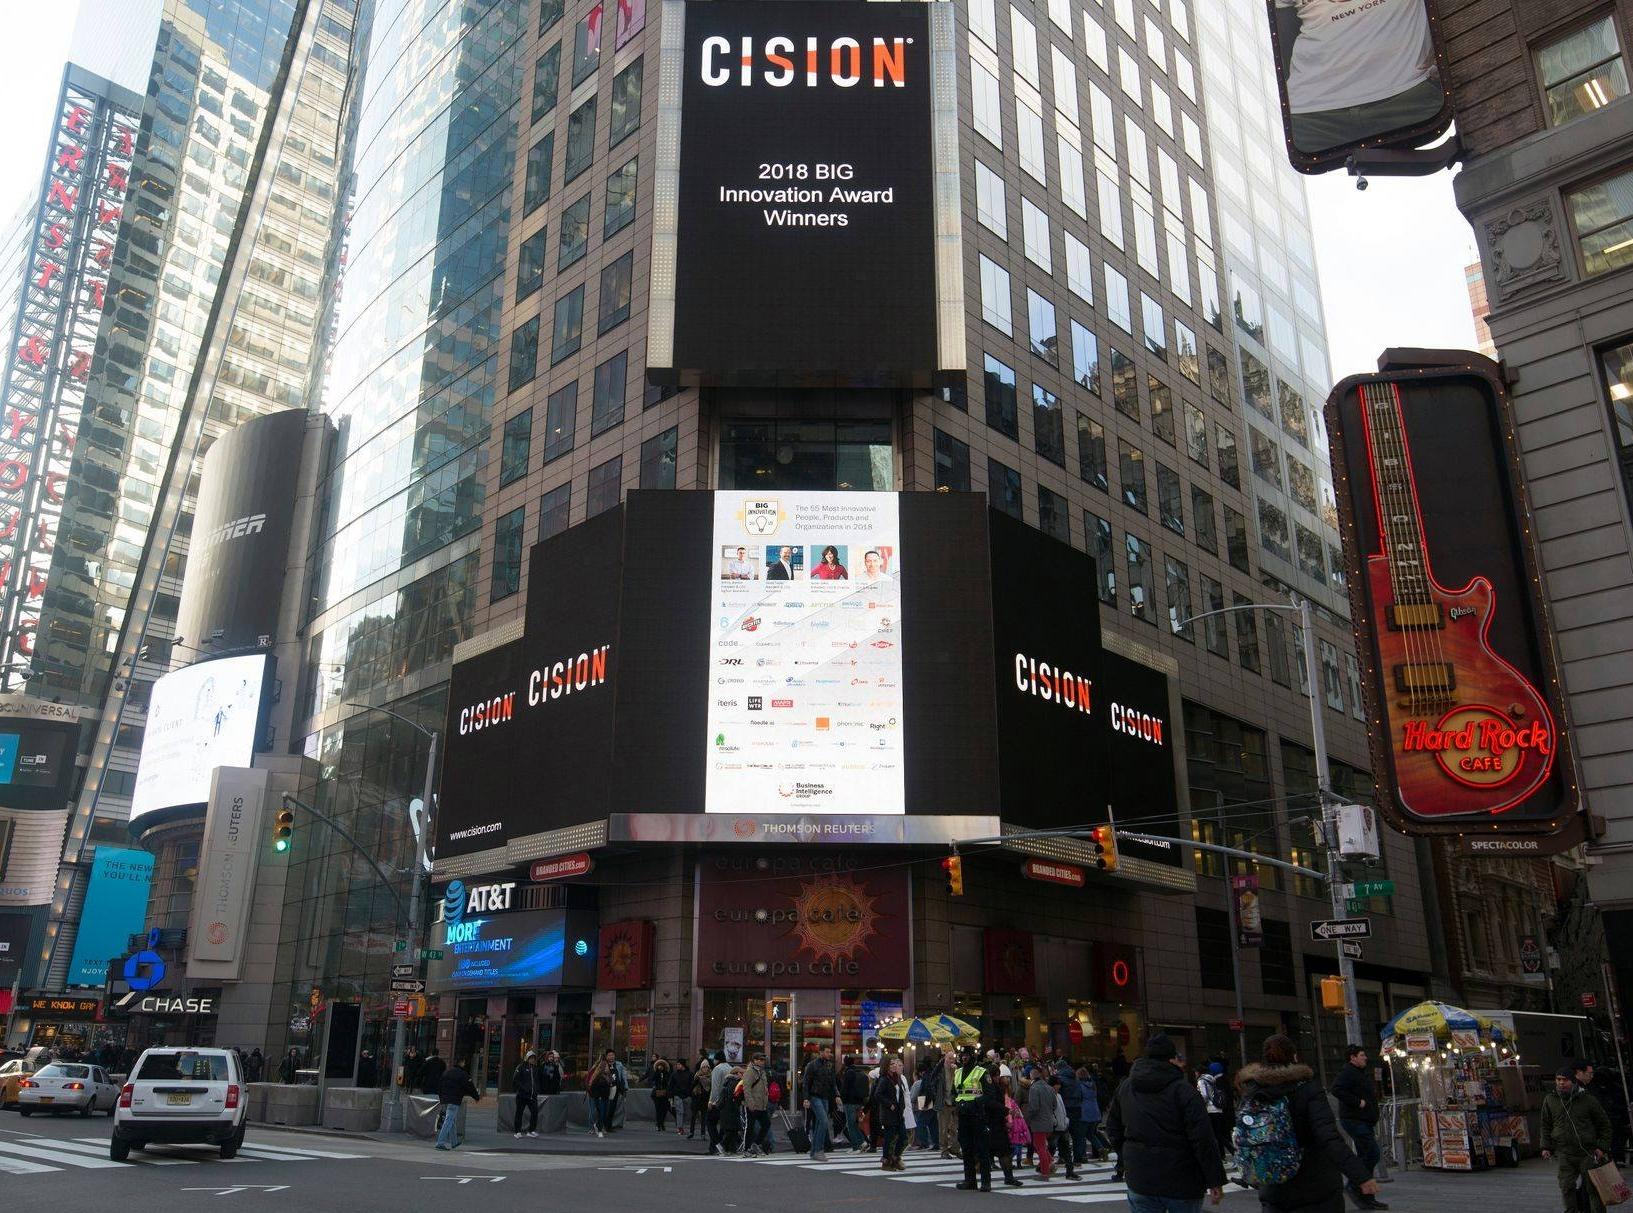 Times Square 2018 - Big Innovation Award Winners